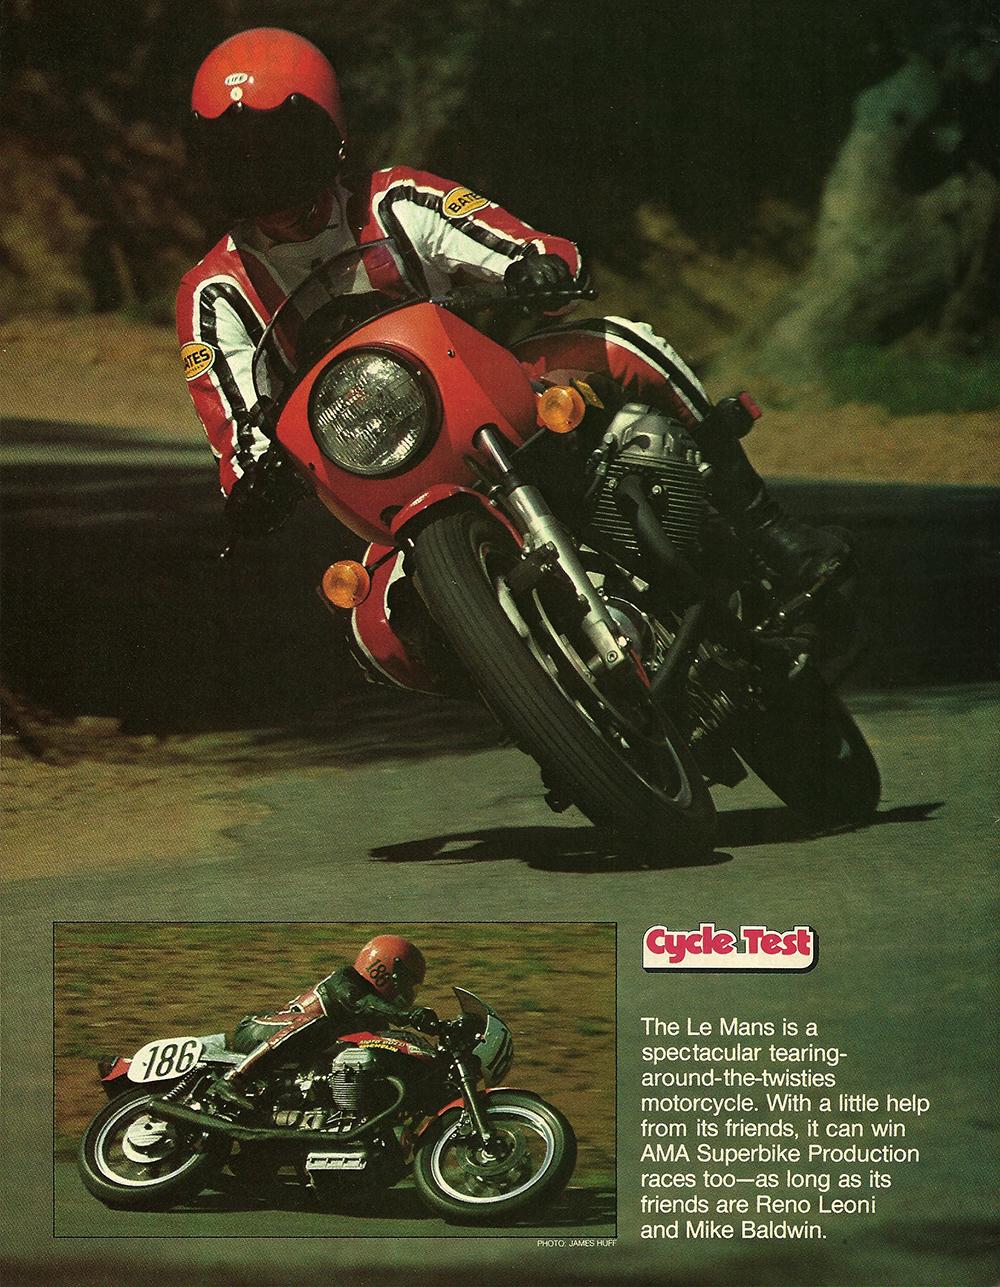 1977 Moto Guzzi 850 LeMans road test 01.jpg